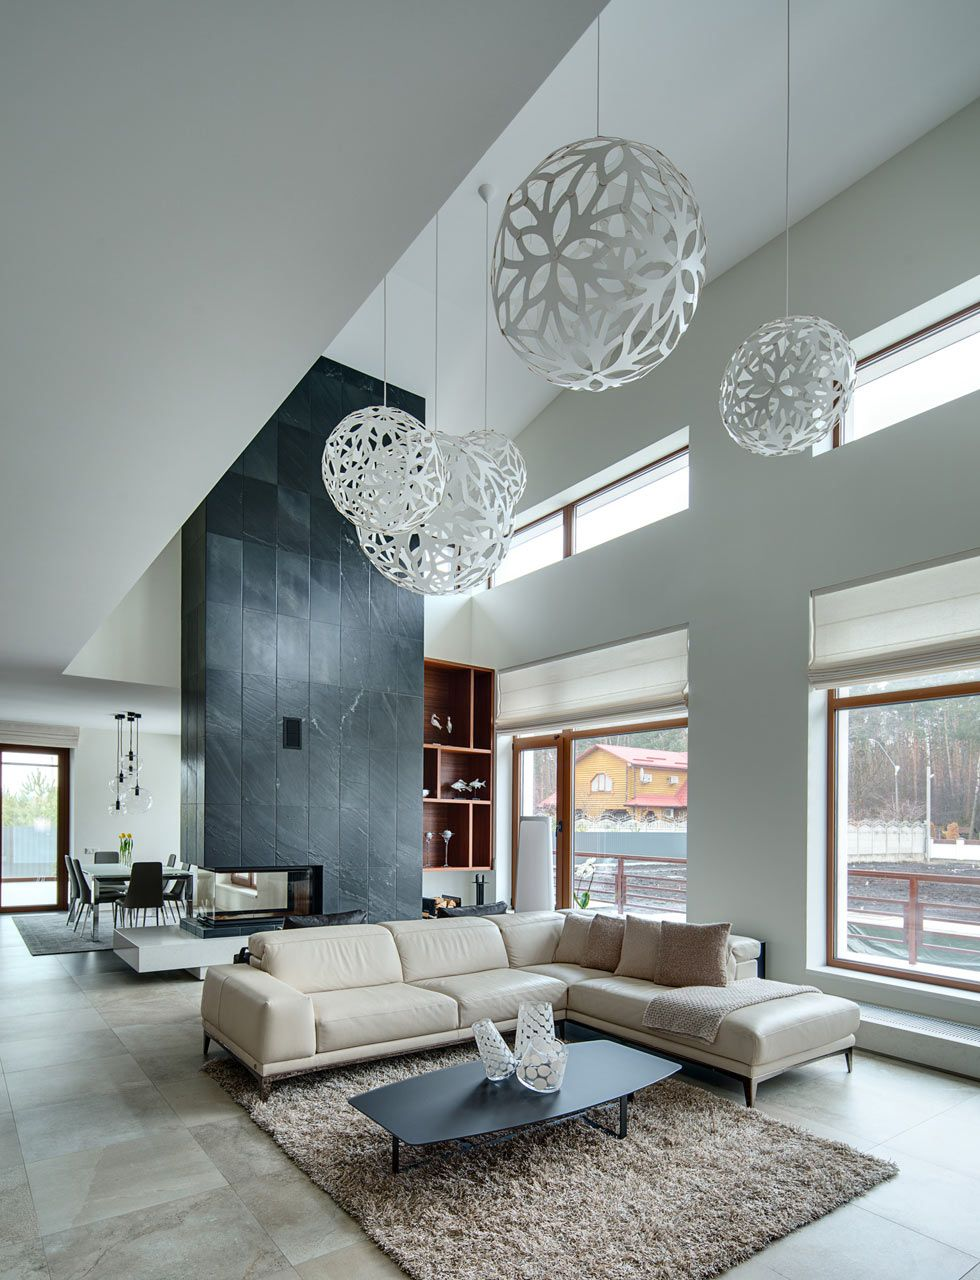 Spacious Home with a Warm Interior in Kiev #modernhousedesigninterior